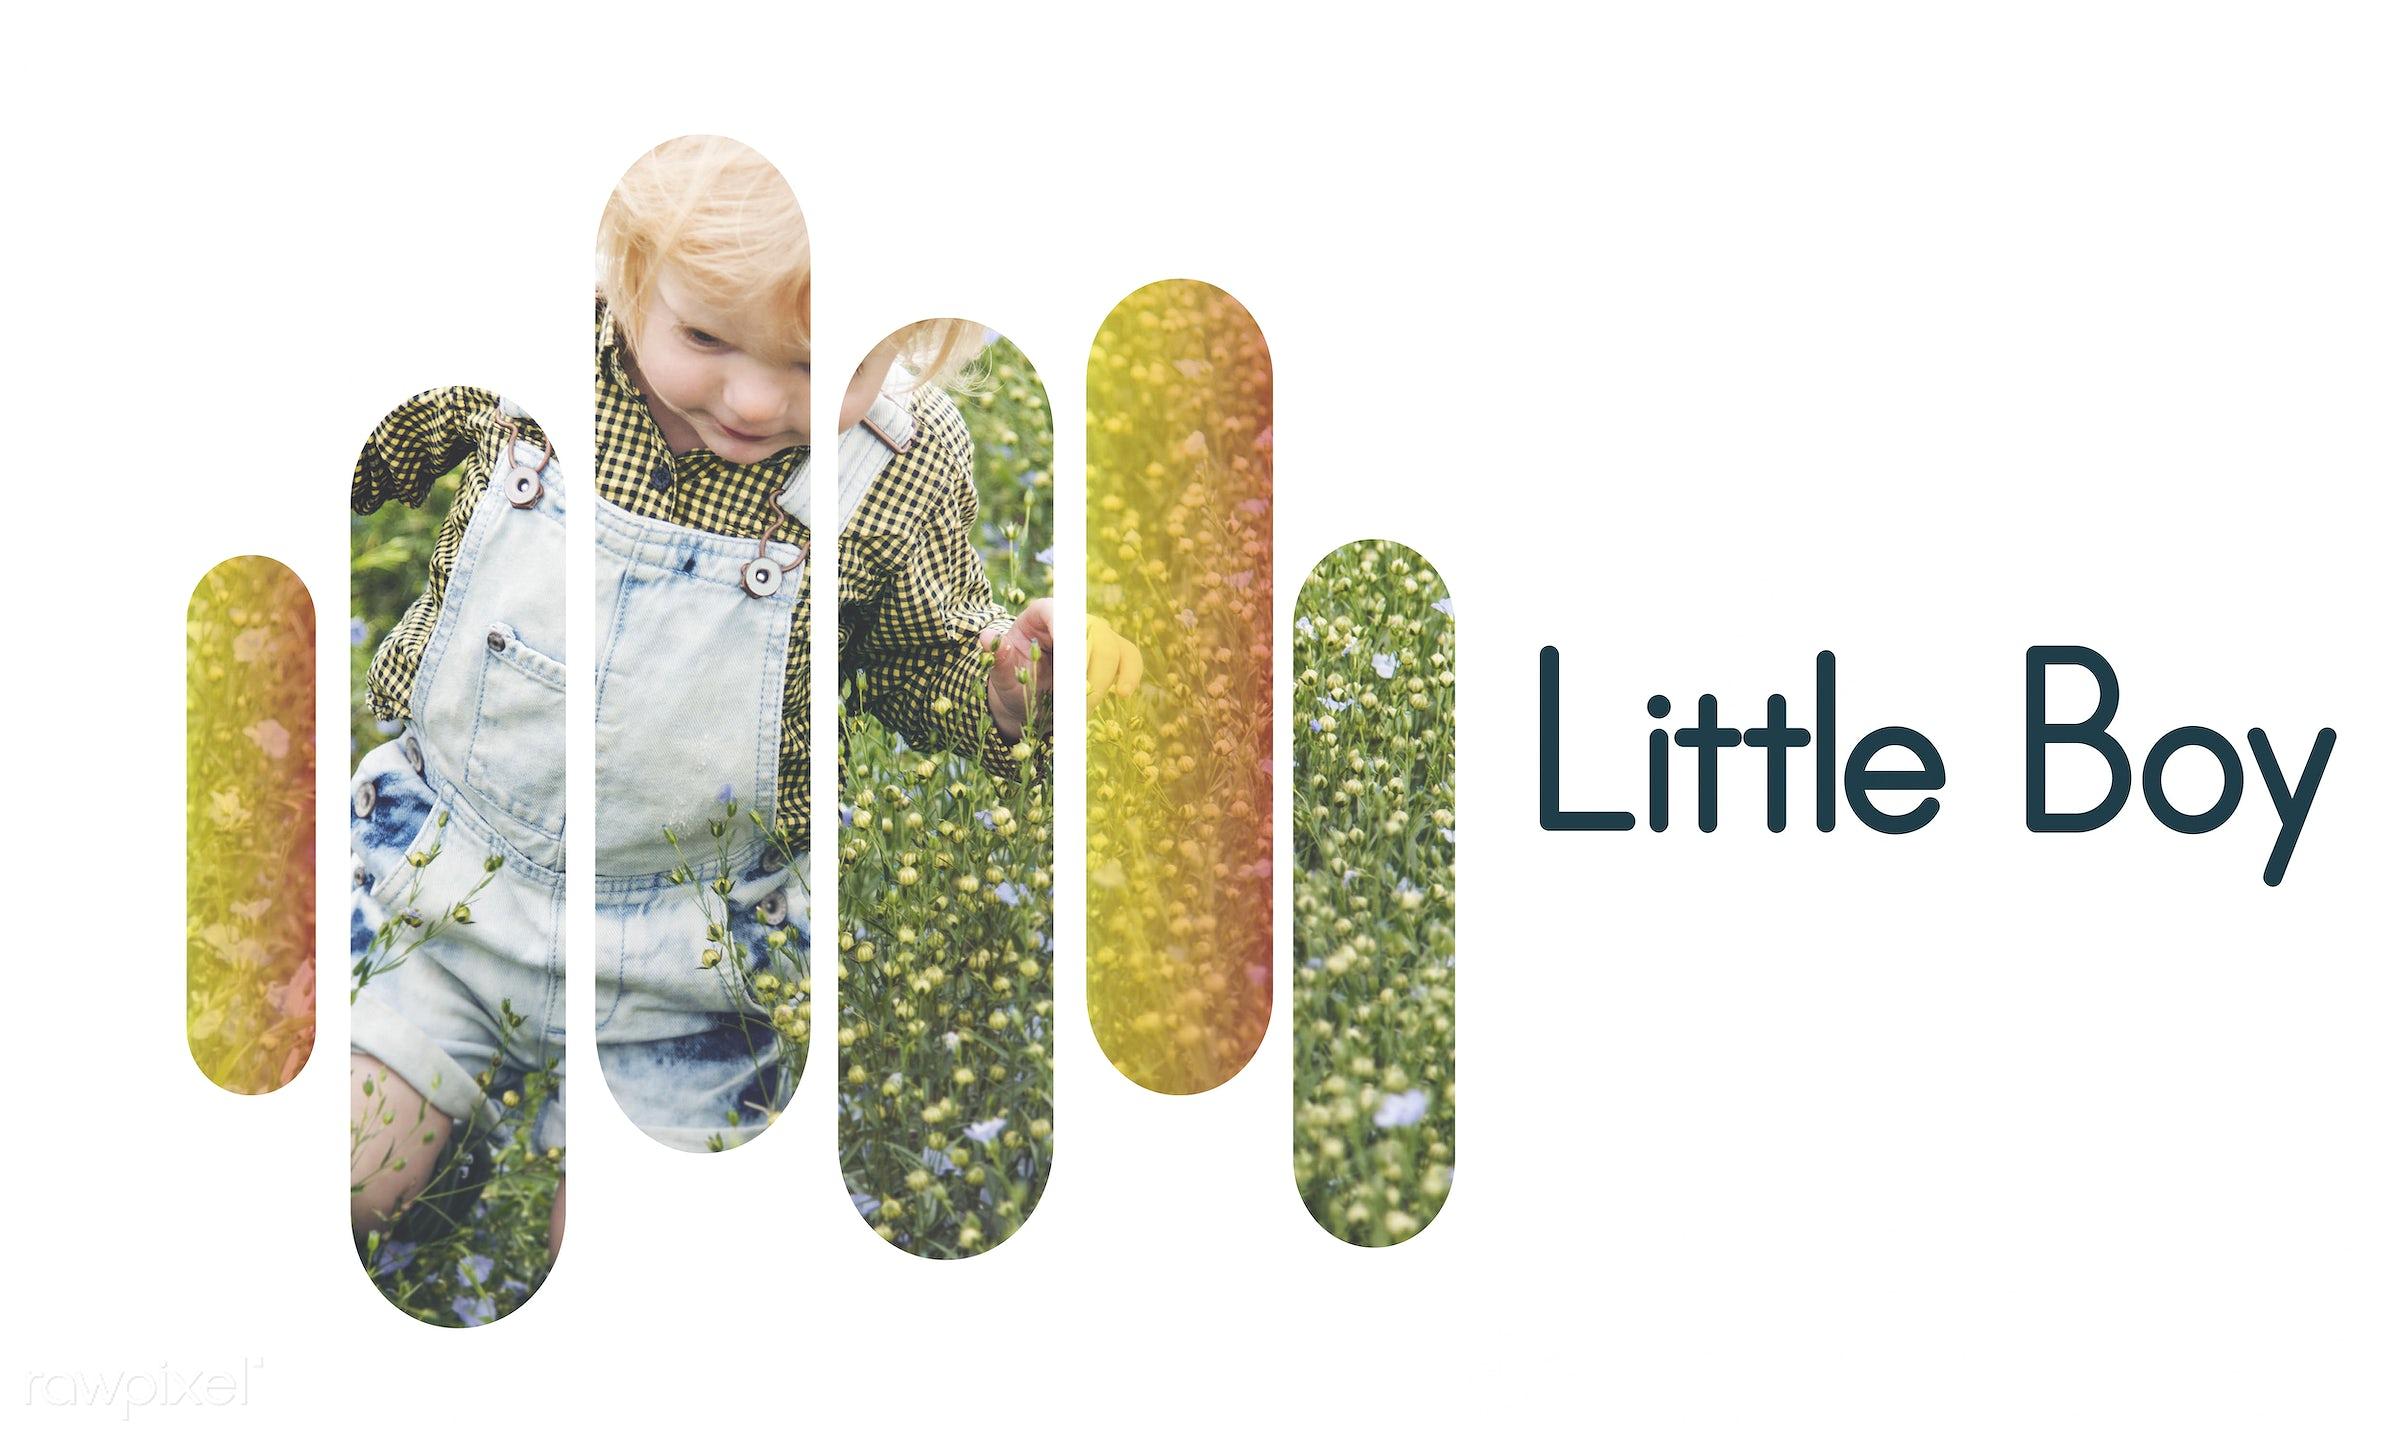 adorable, baby, blameless, boy, child, childhood, children, curiosity, curious, cute, flowers, innocence, integrity,...